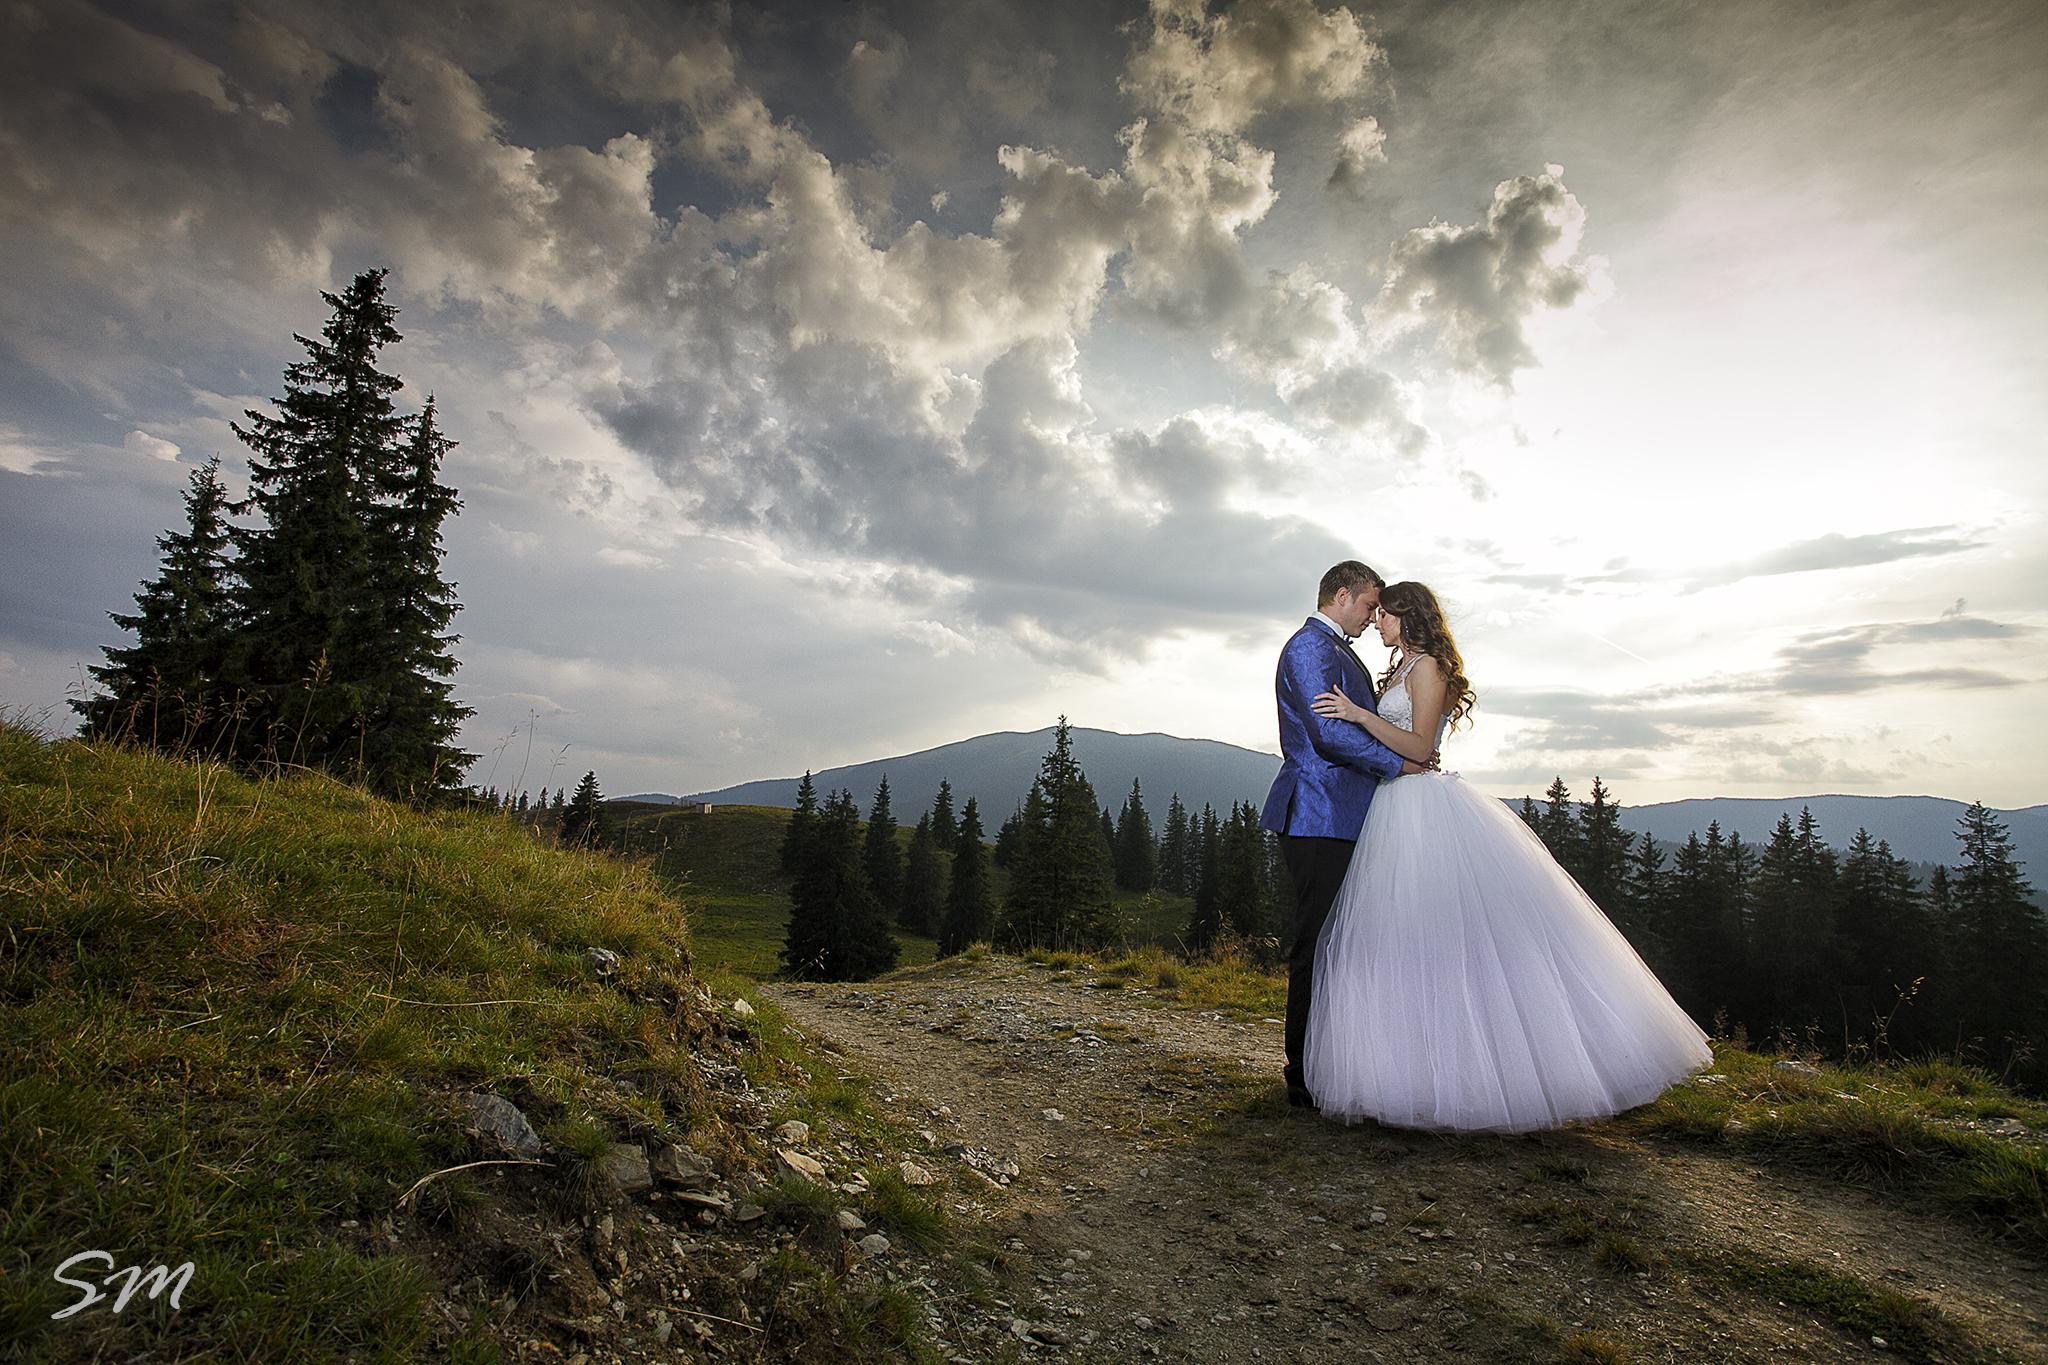 fotograf-nunta-suceava (5)